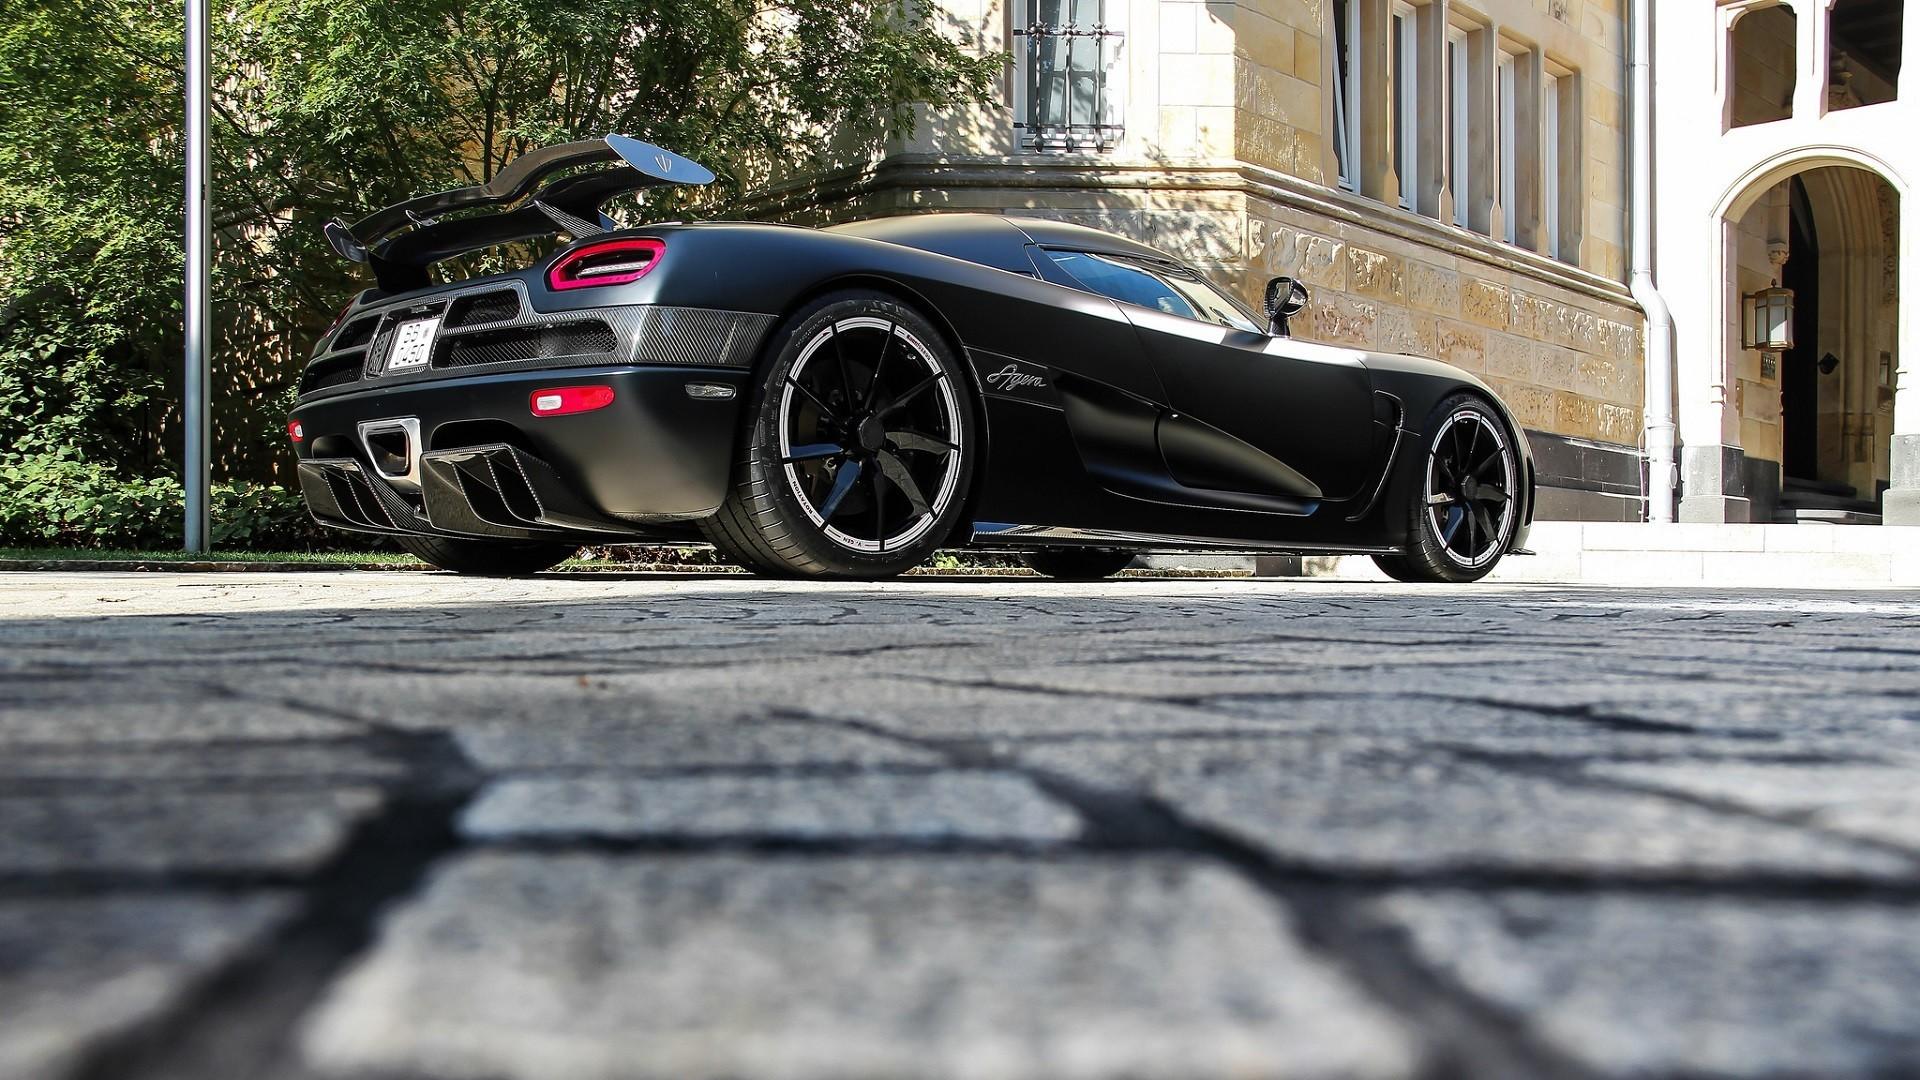 Fahrzeuge – Koenigsegg Agera Sport Car Koenigsegg Autos Fahrzeug Black Car Koenigsegg  Agera R Wallpaper